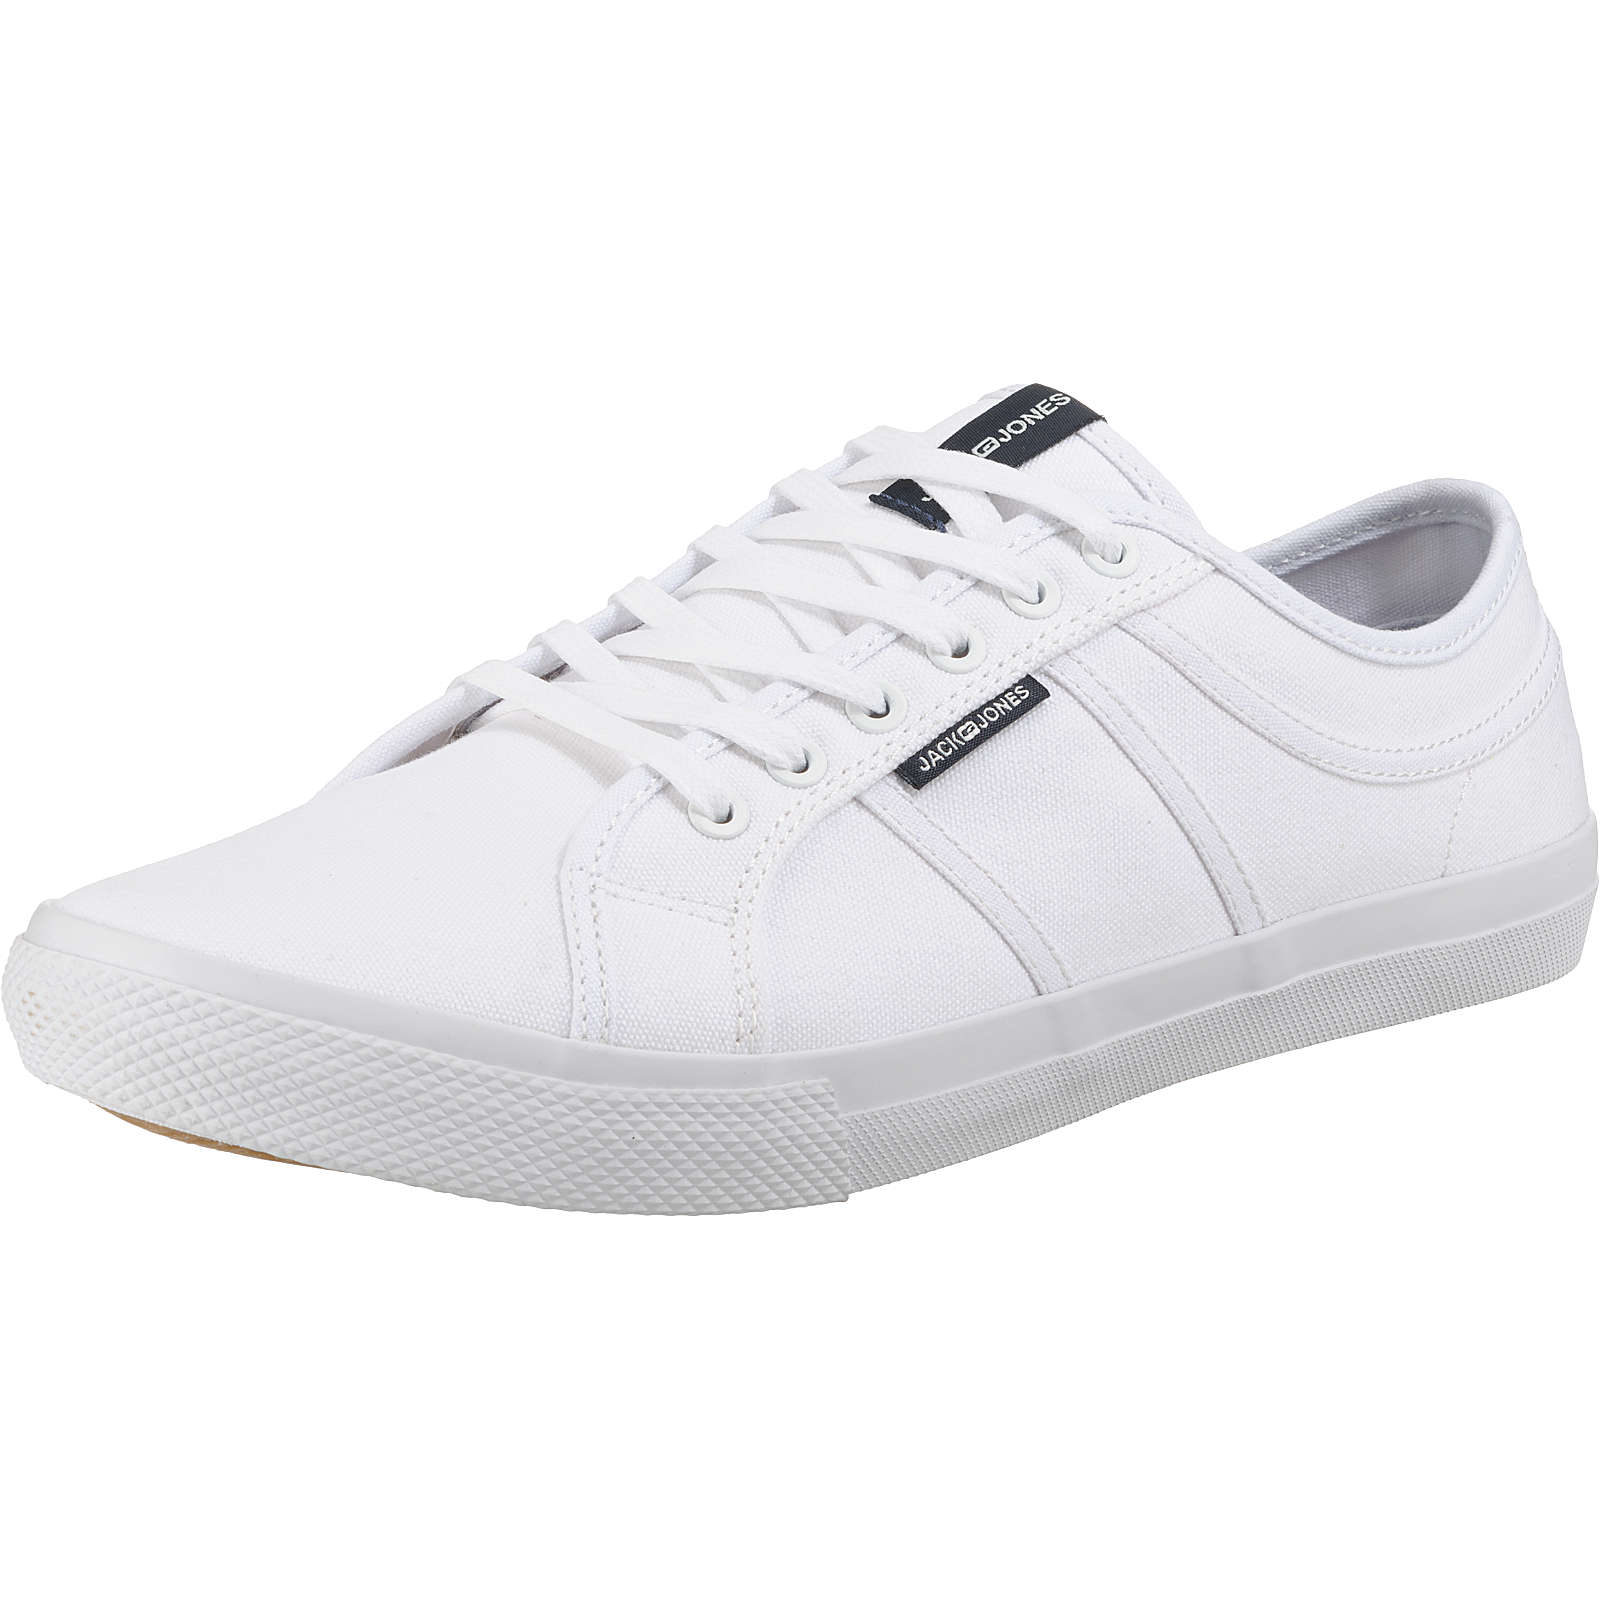 JACK & JONES JFWROSS CANVAS BRIGHT WHITE STS Sneakers Low weiß Herren Gr. 42